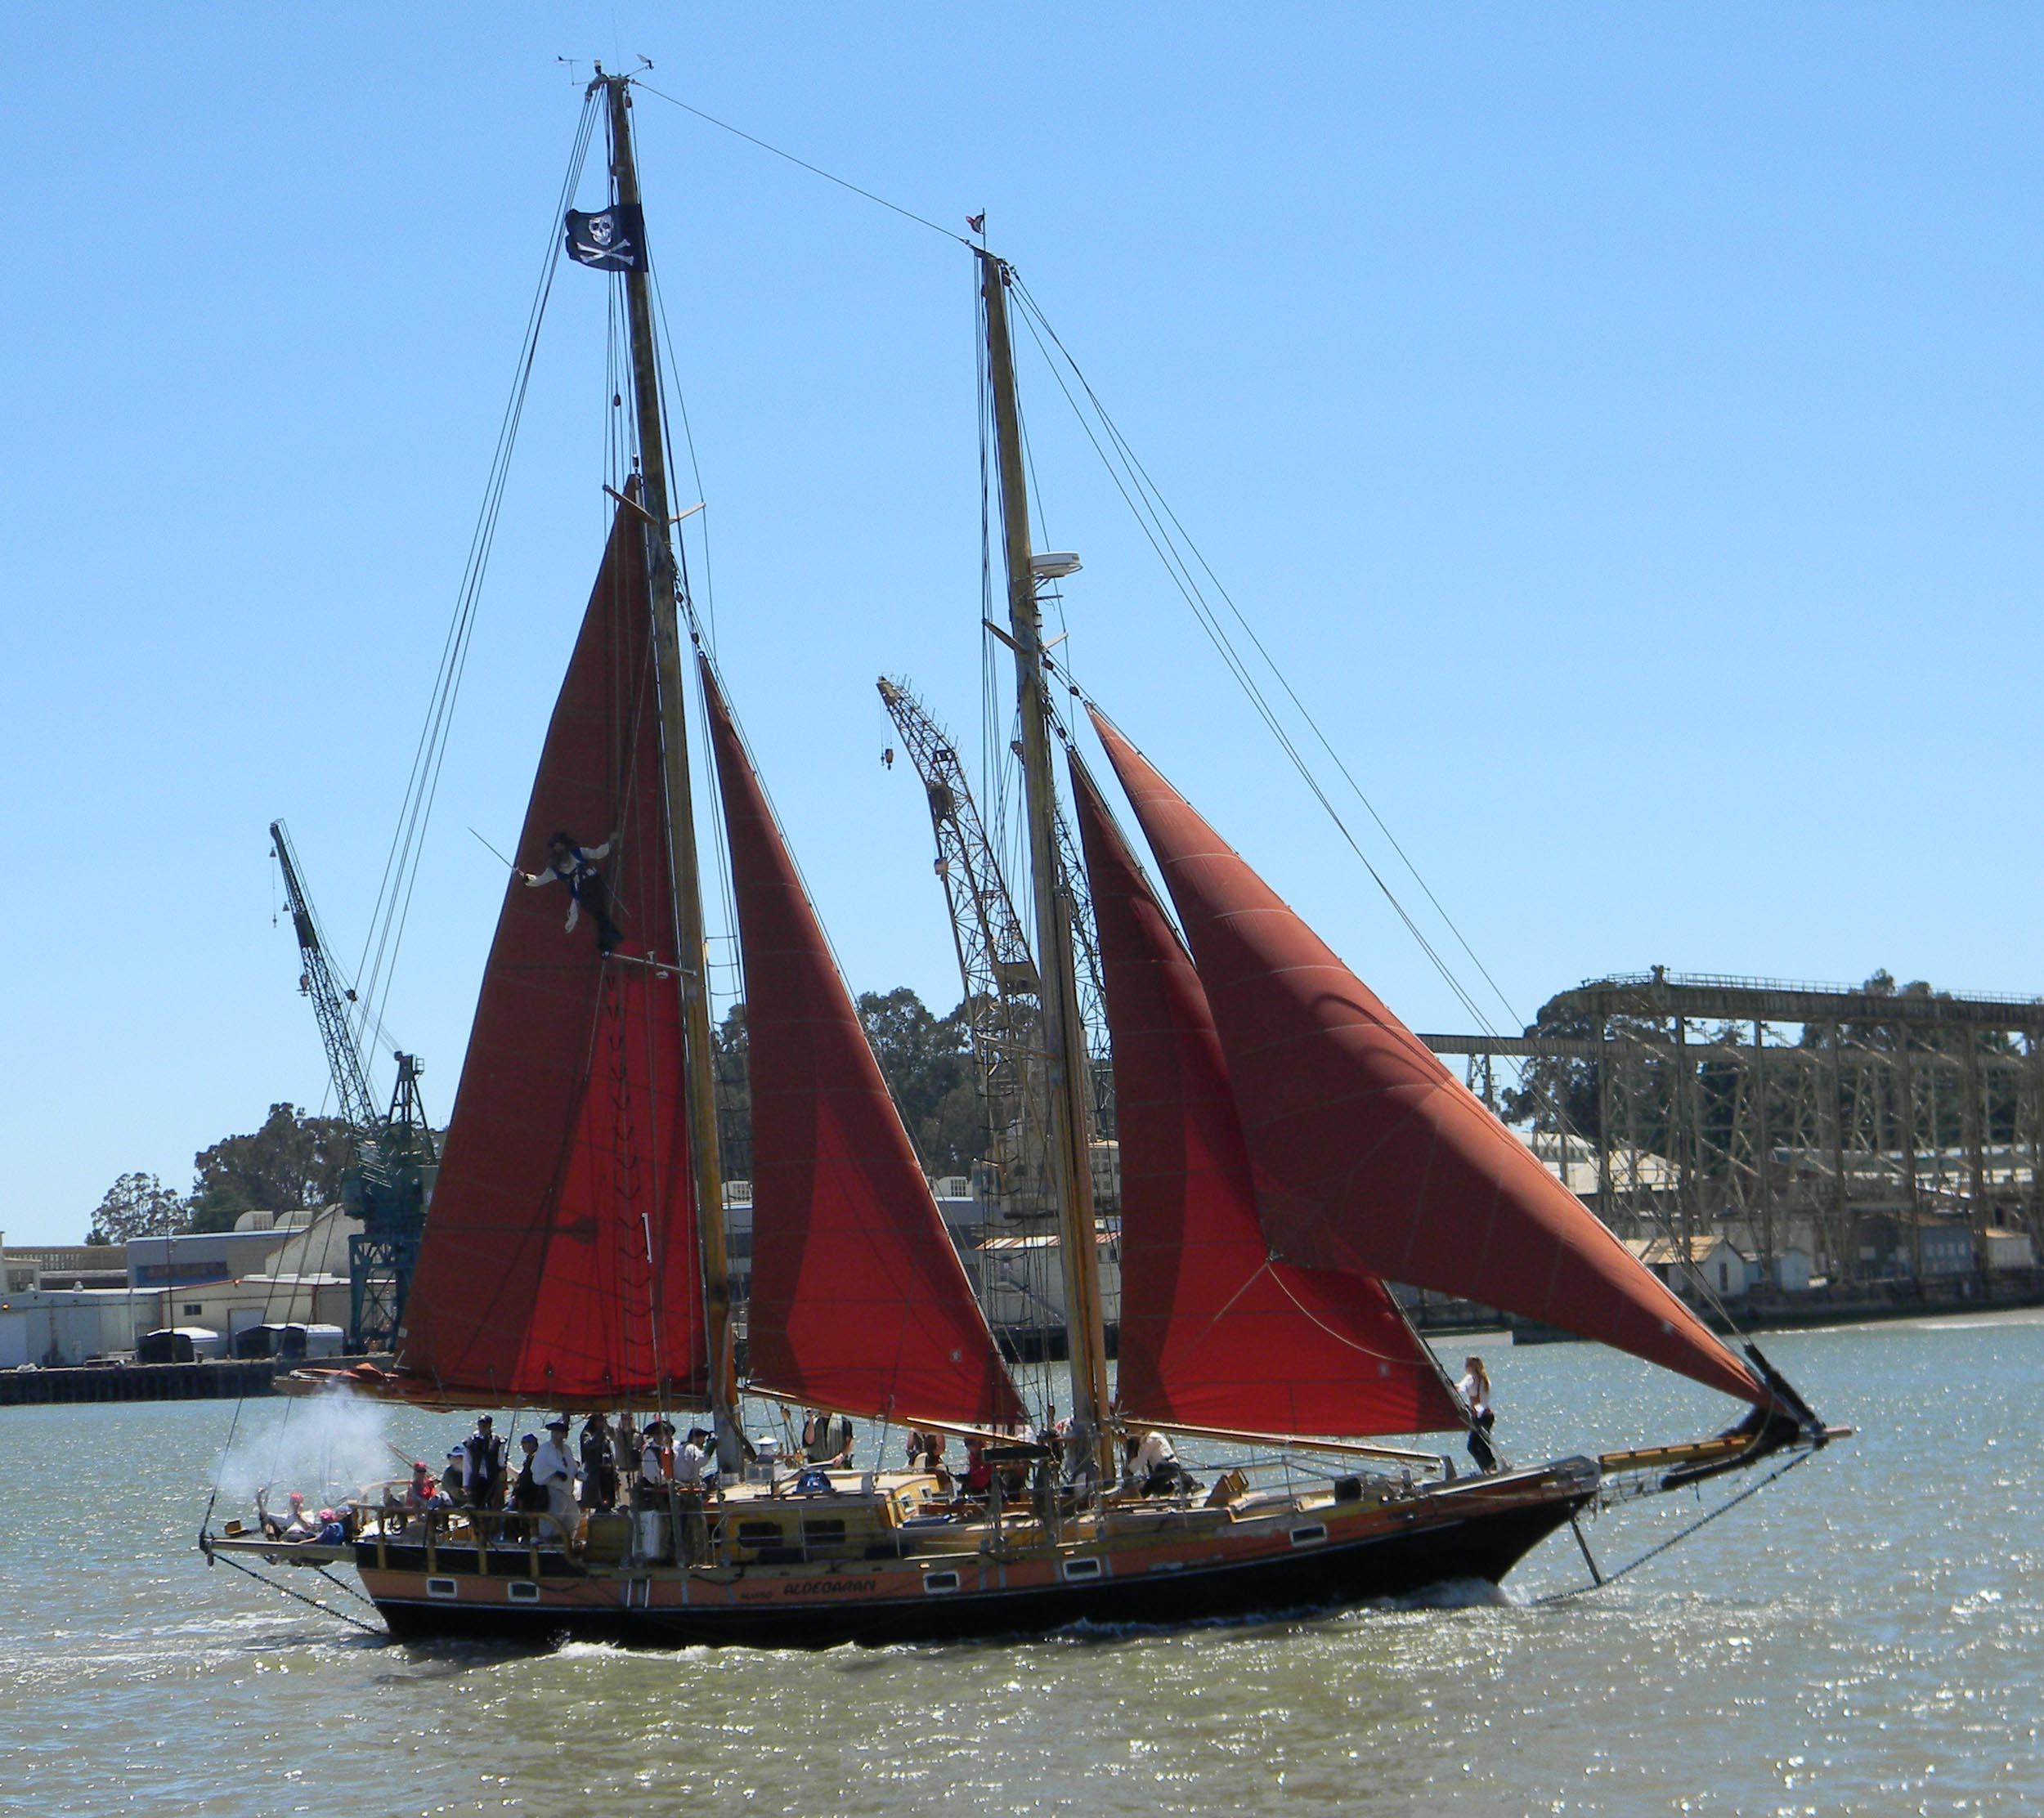 Aldebaran, pirate ship, in Bay wreck